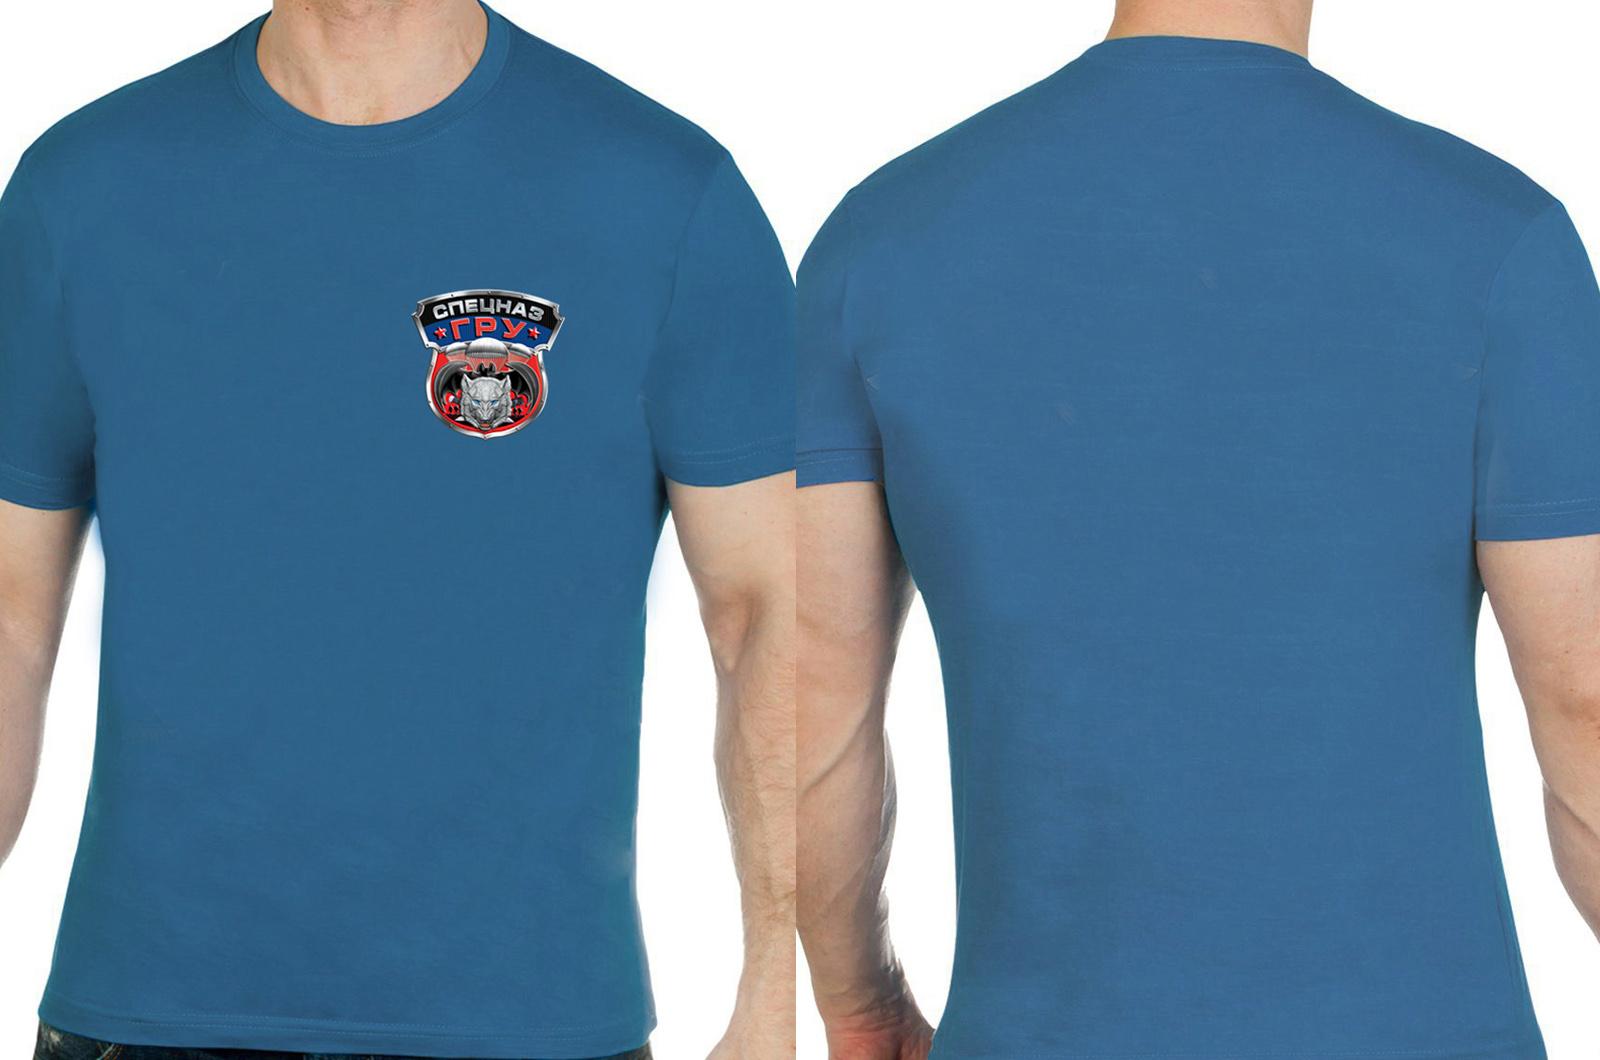 Безупречная футболка спецназовца ГРУ